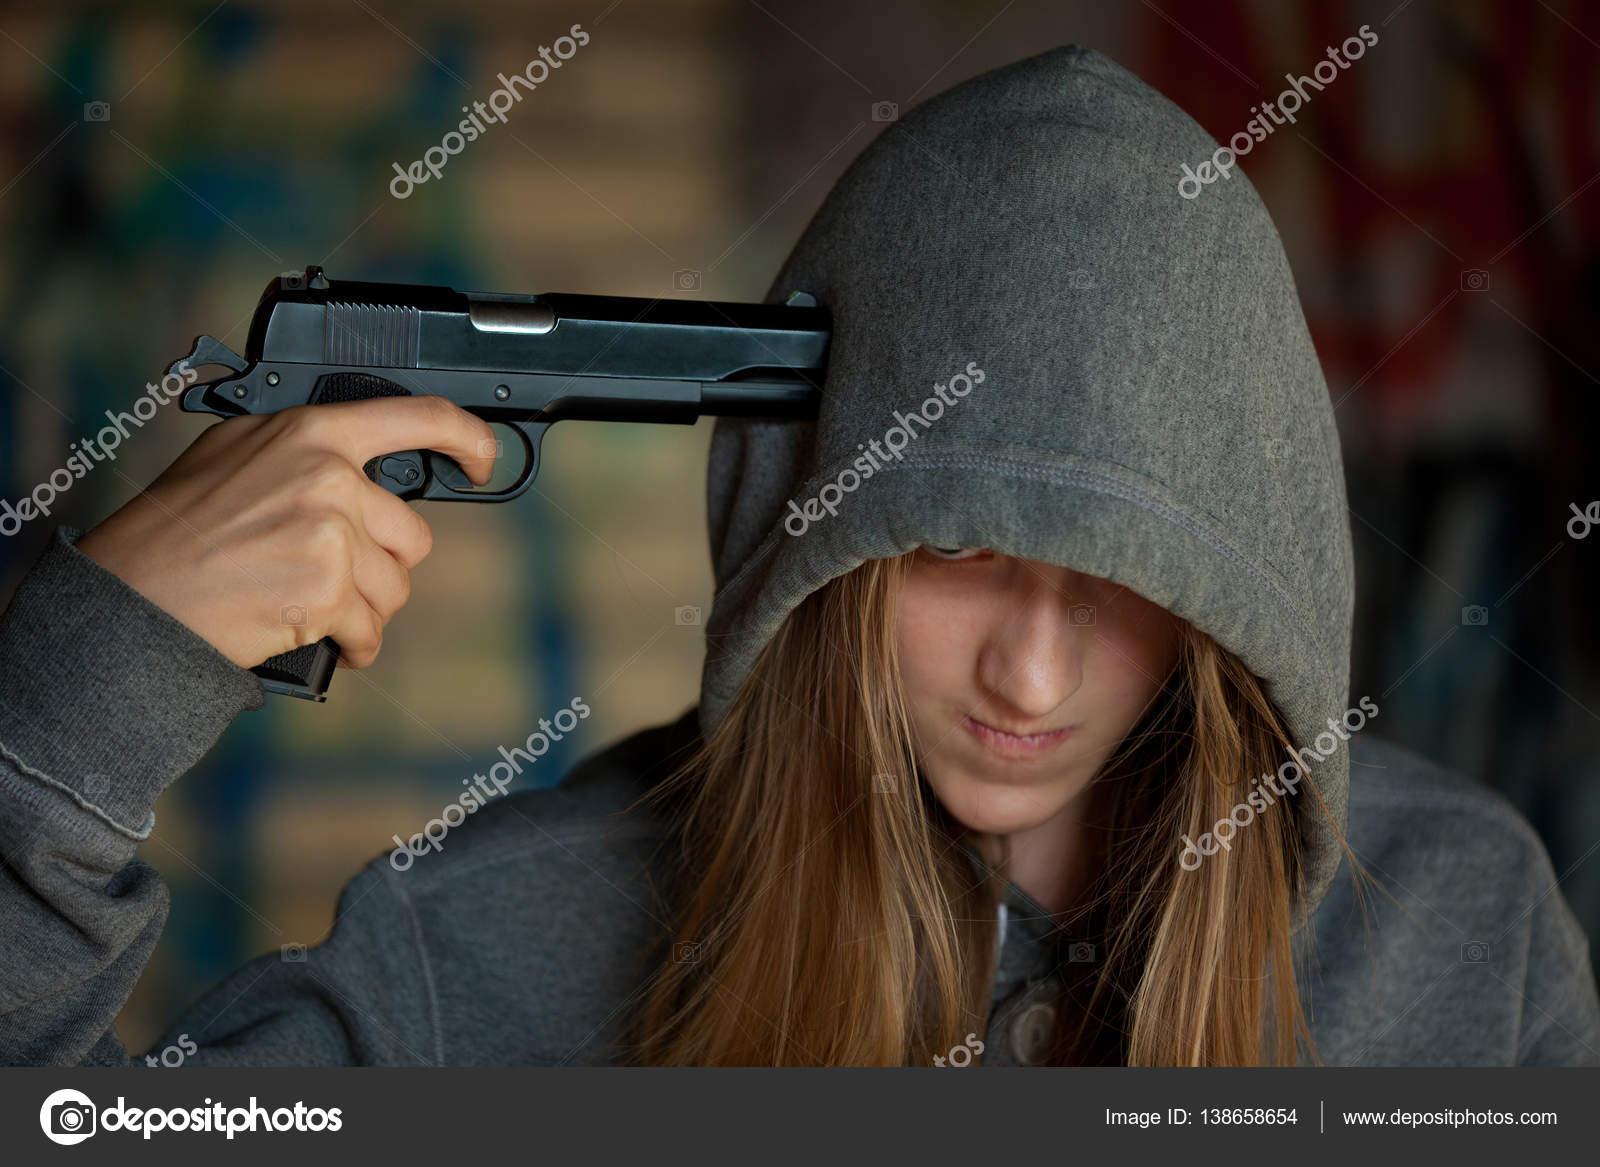 teen-girl-with-gun